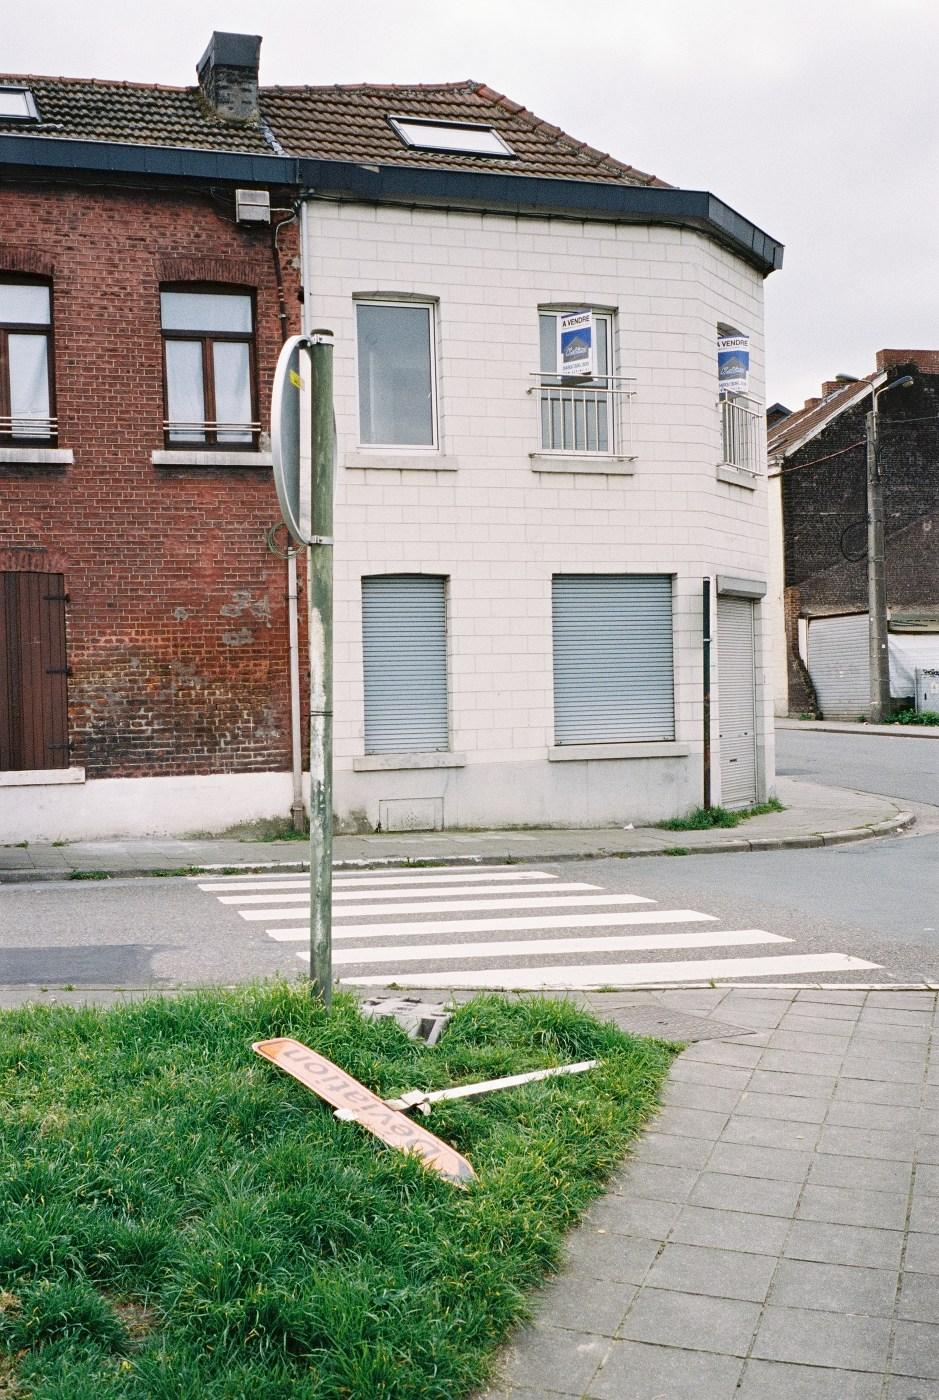 000026JoergBergs-KodakPortra400-MeinFilmLab-M7-35 (2)